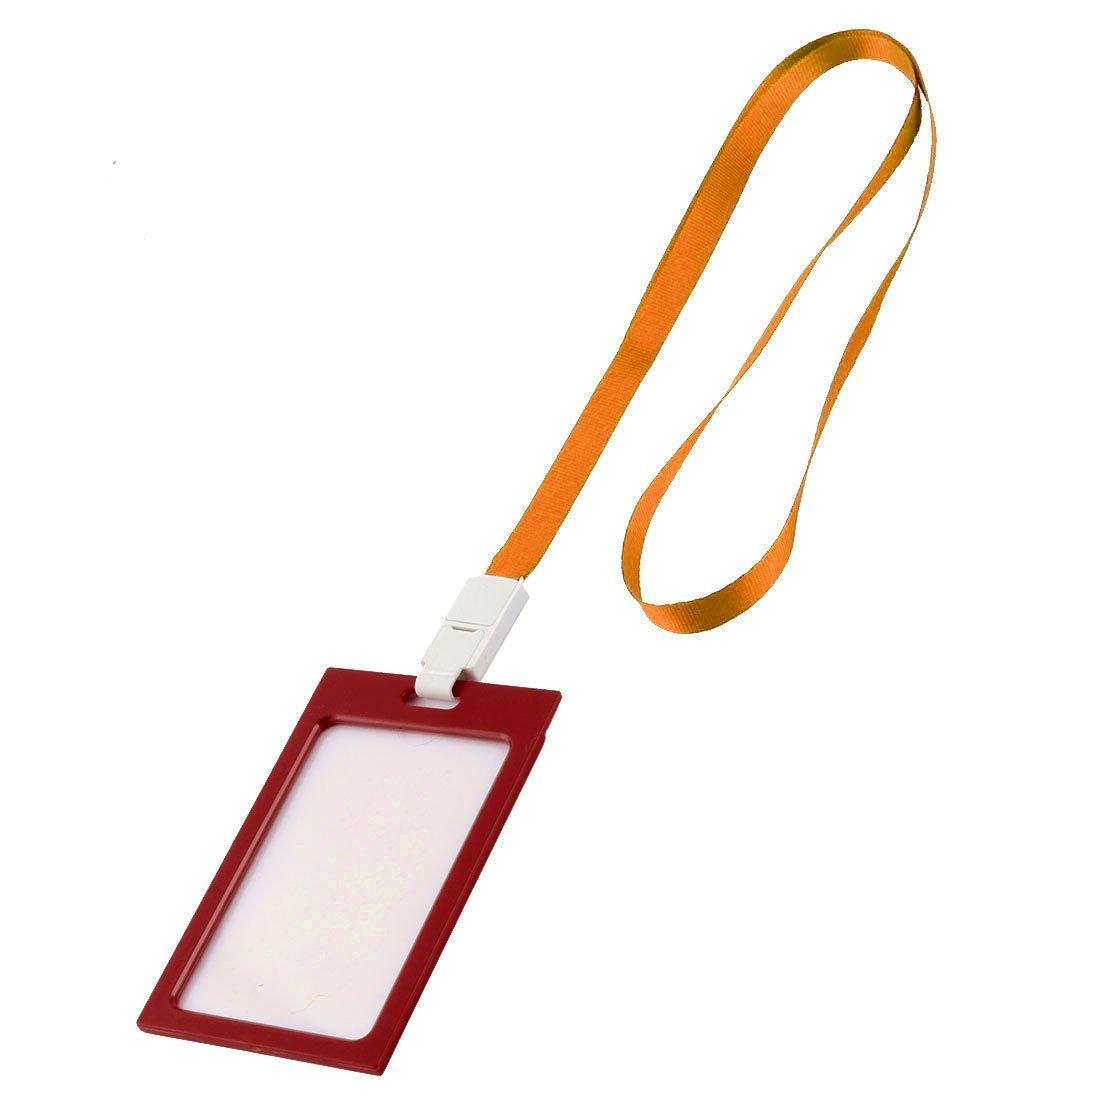 DealMux Plastic Rim Vertical Staff School Name Card Case Holder 10 Pcs Orange Red